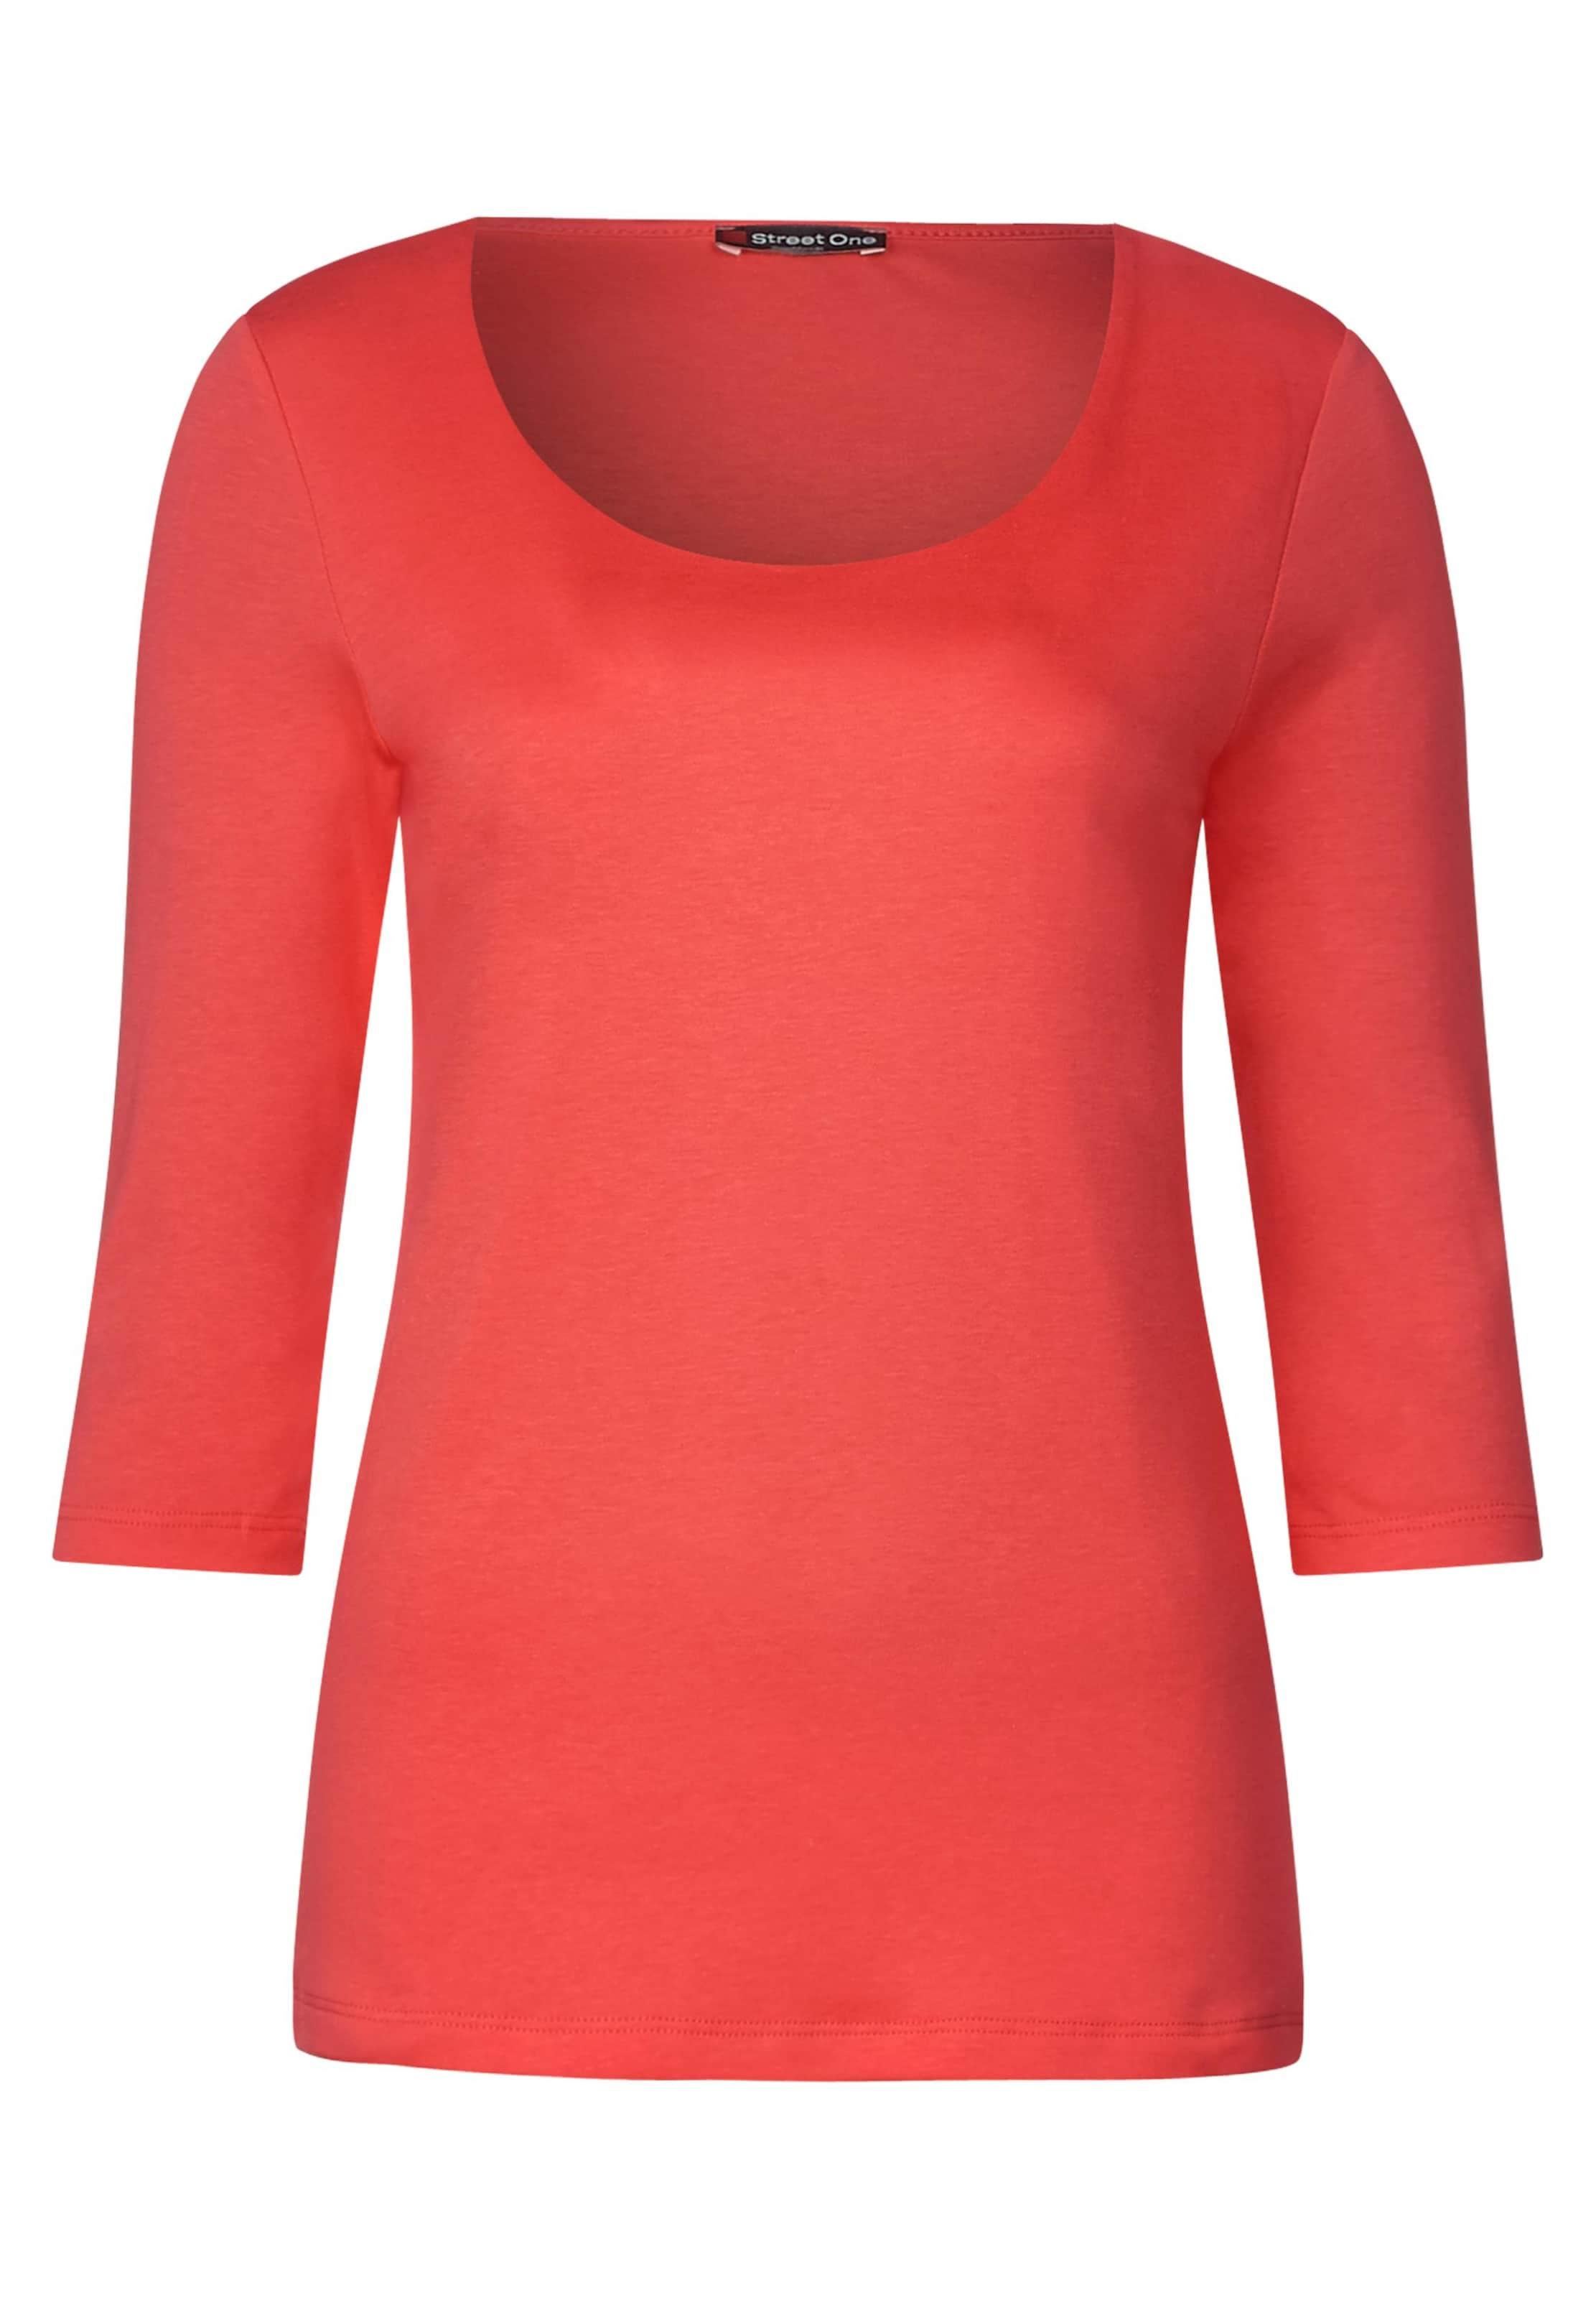 One Street Shirt 'pania' Koralle In qSzpMVGU